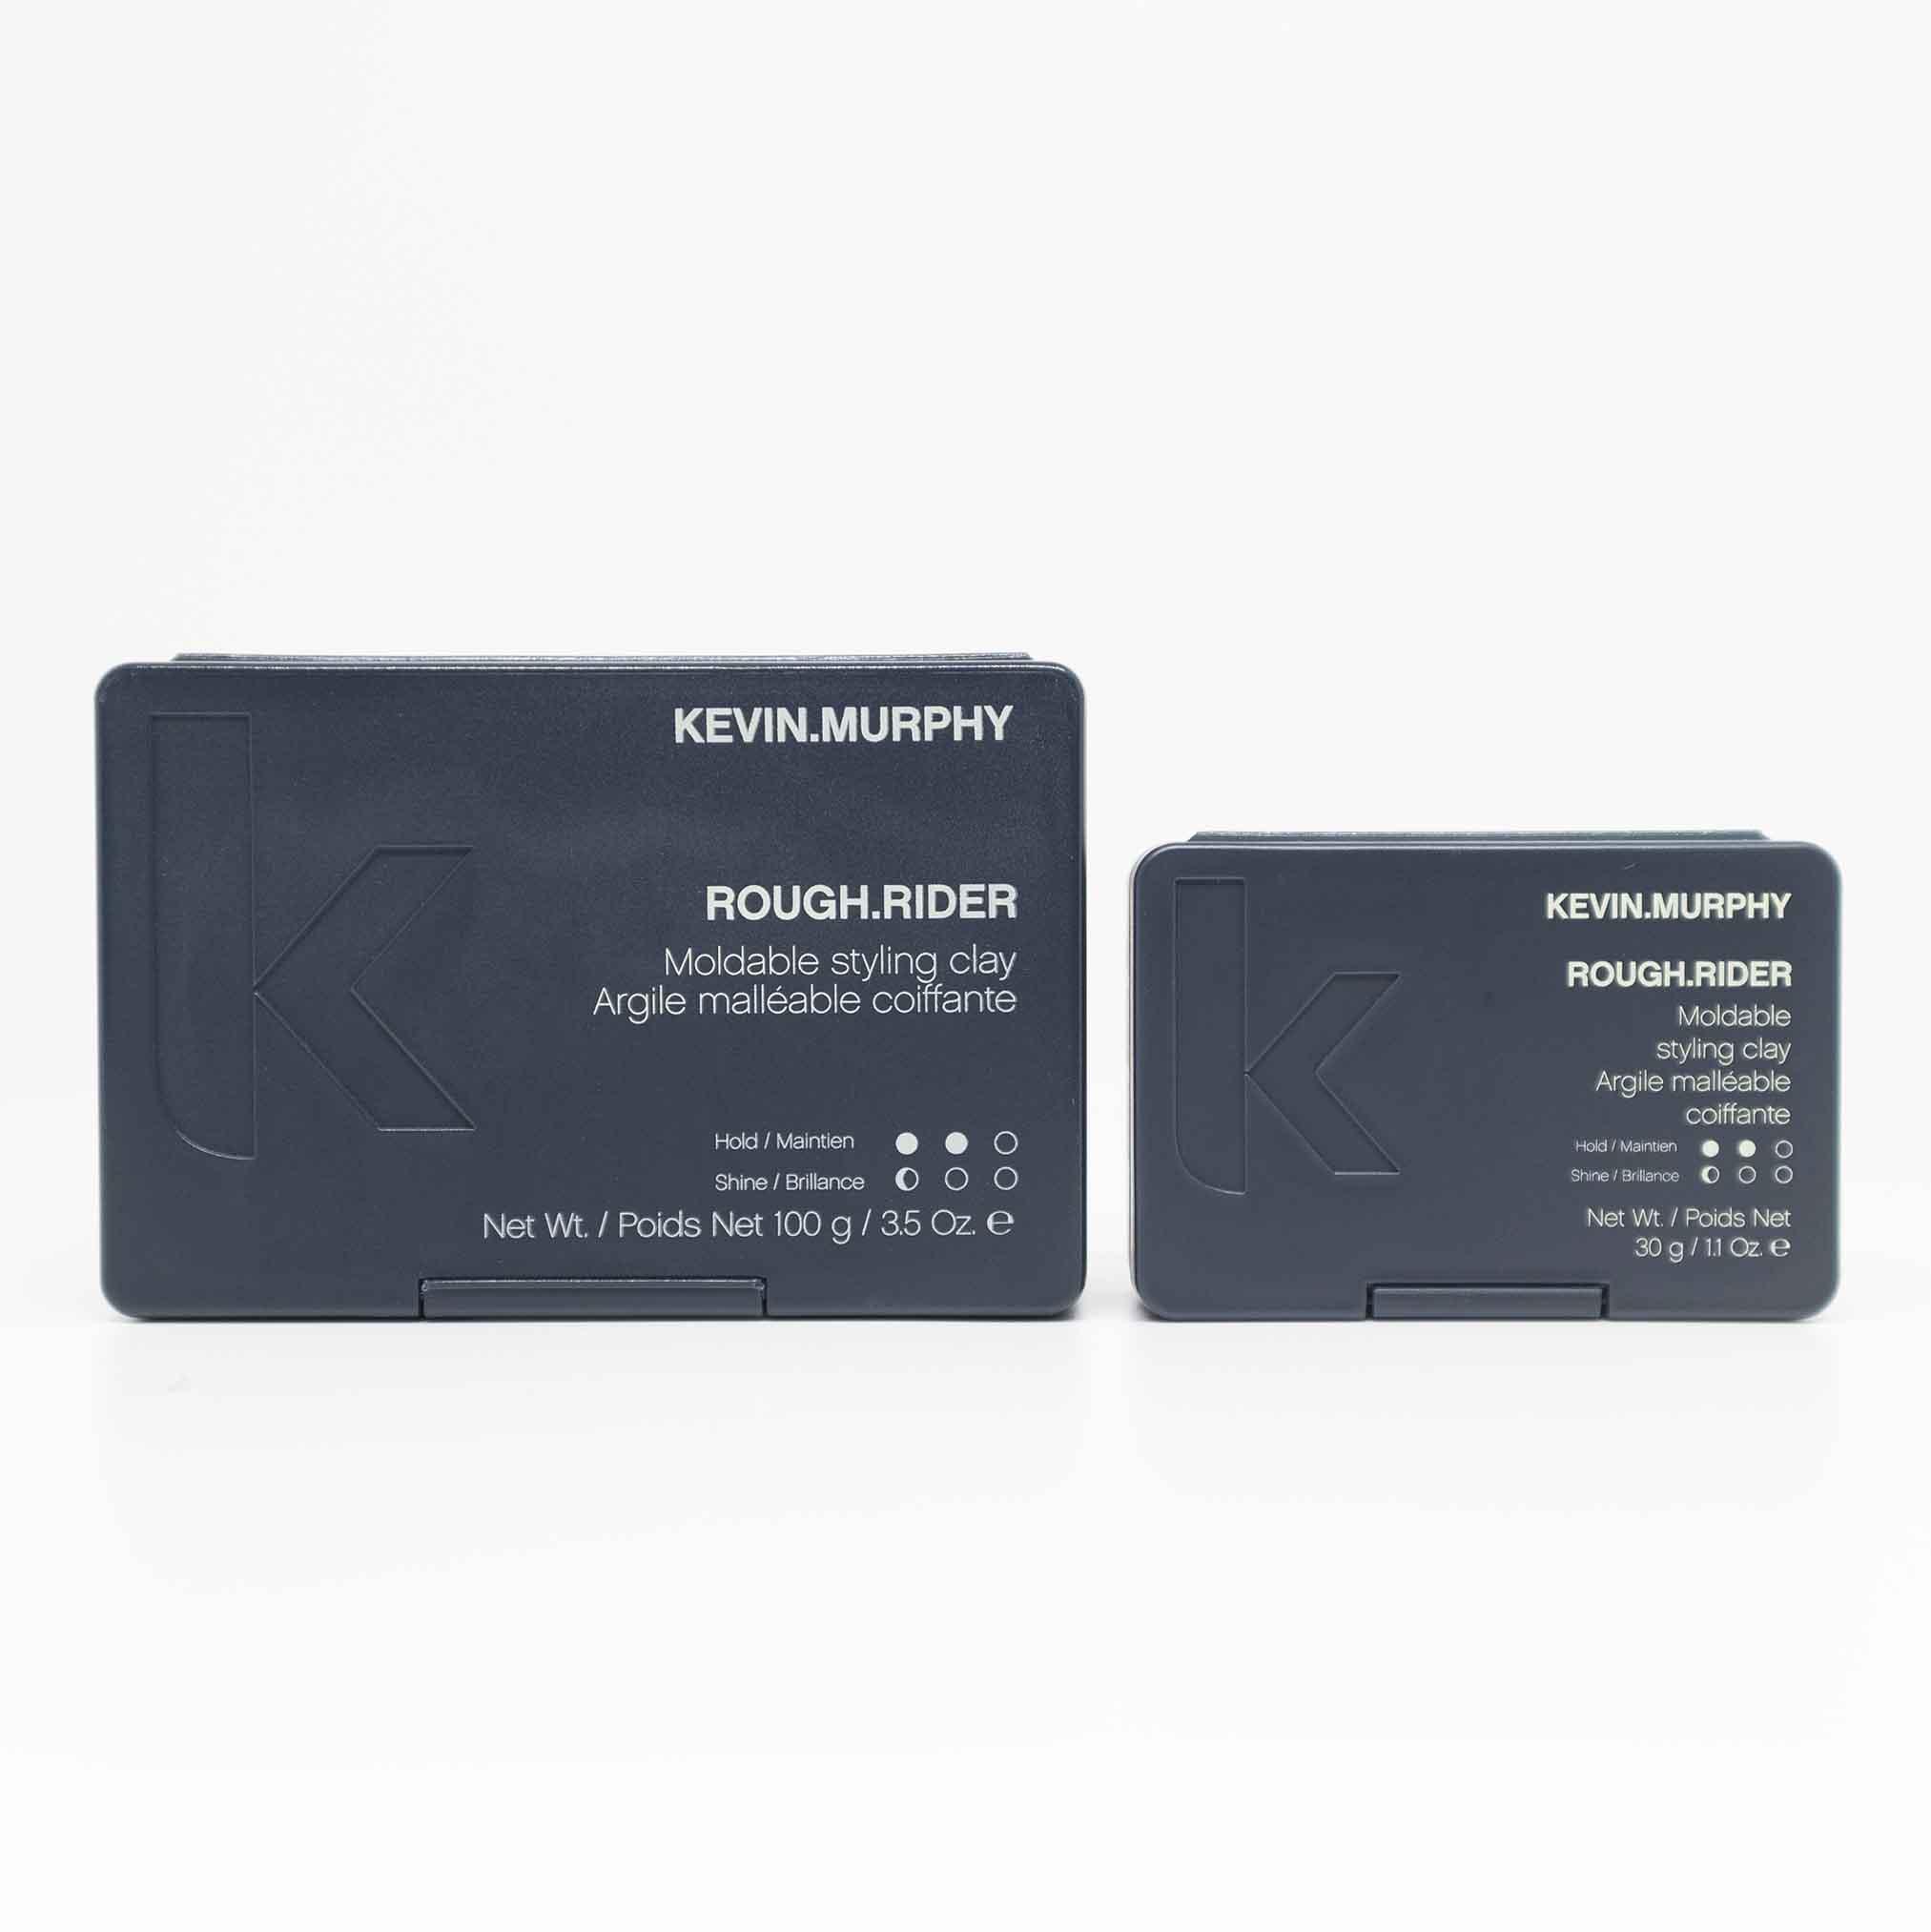 kevin-murphy-rough-rider-30-gram-04